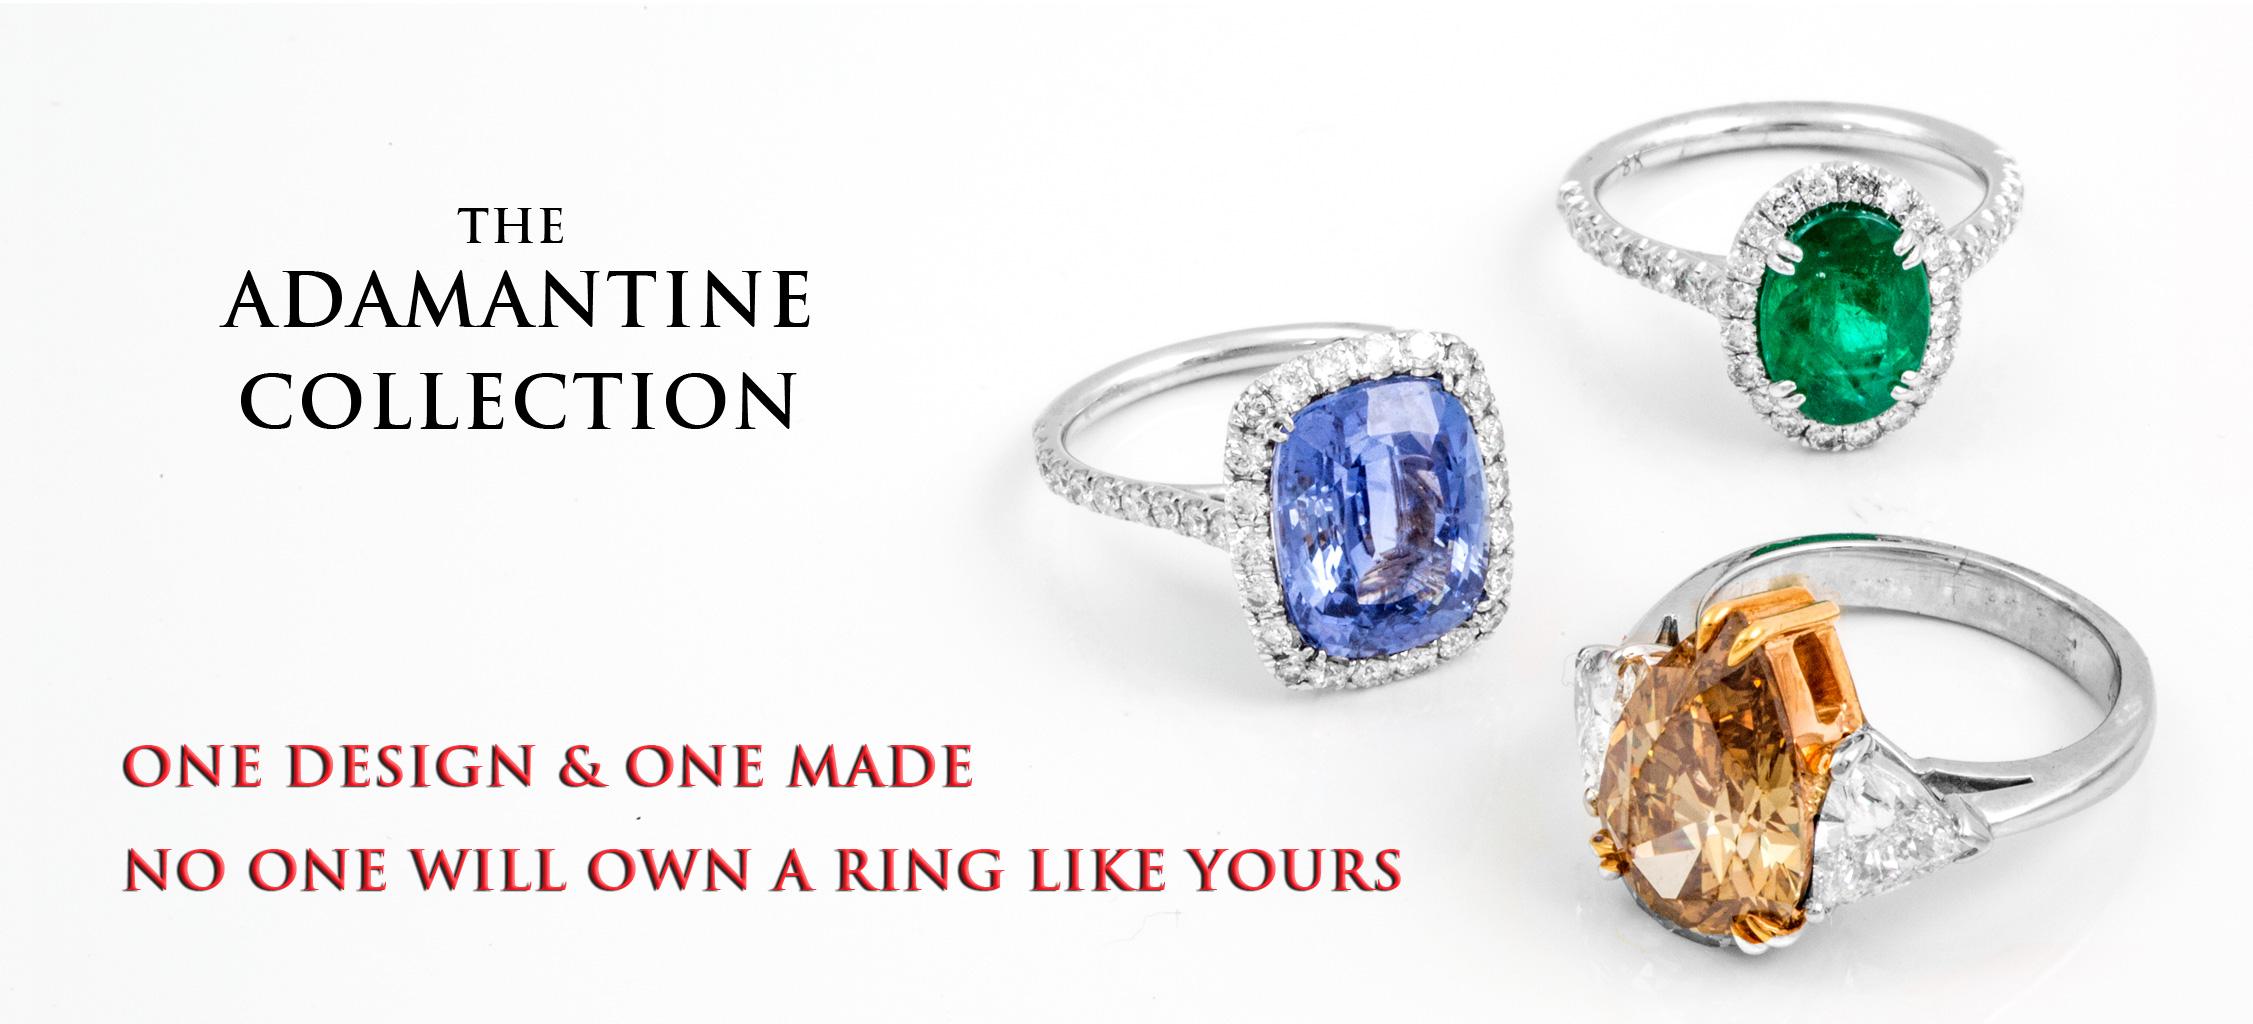 Gemstone Rings Diamonds Sapphires Topaz Emerald - Jewelry Store Torrance